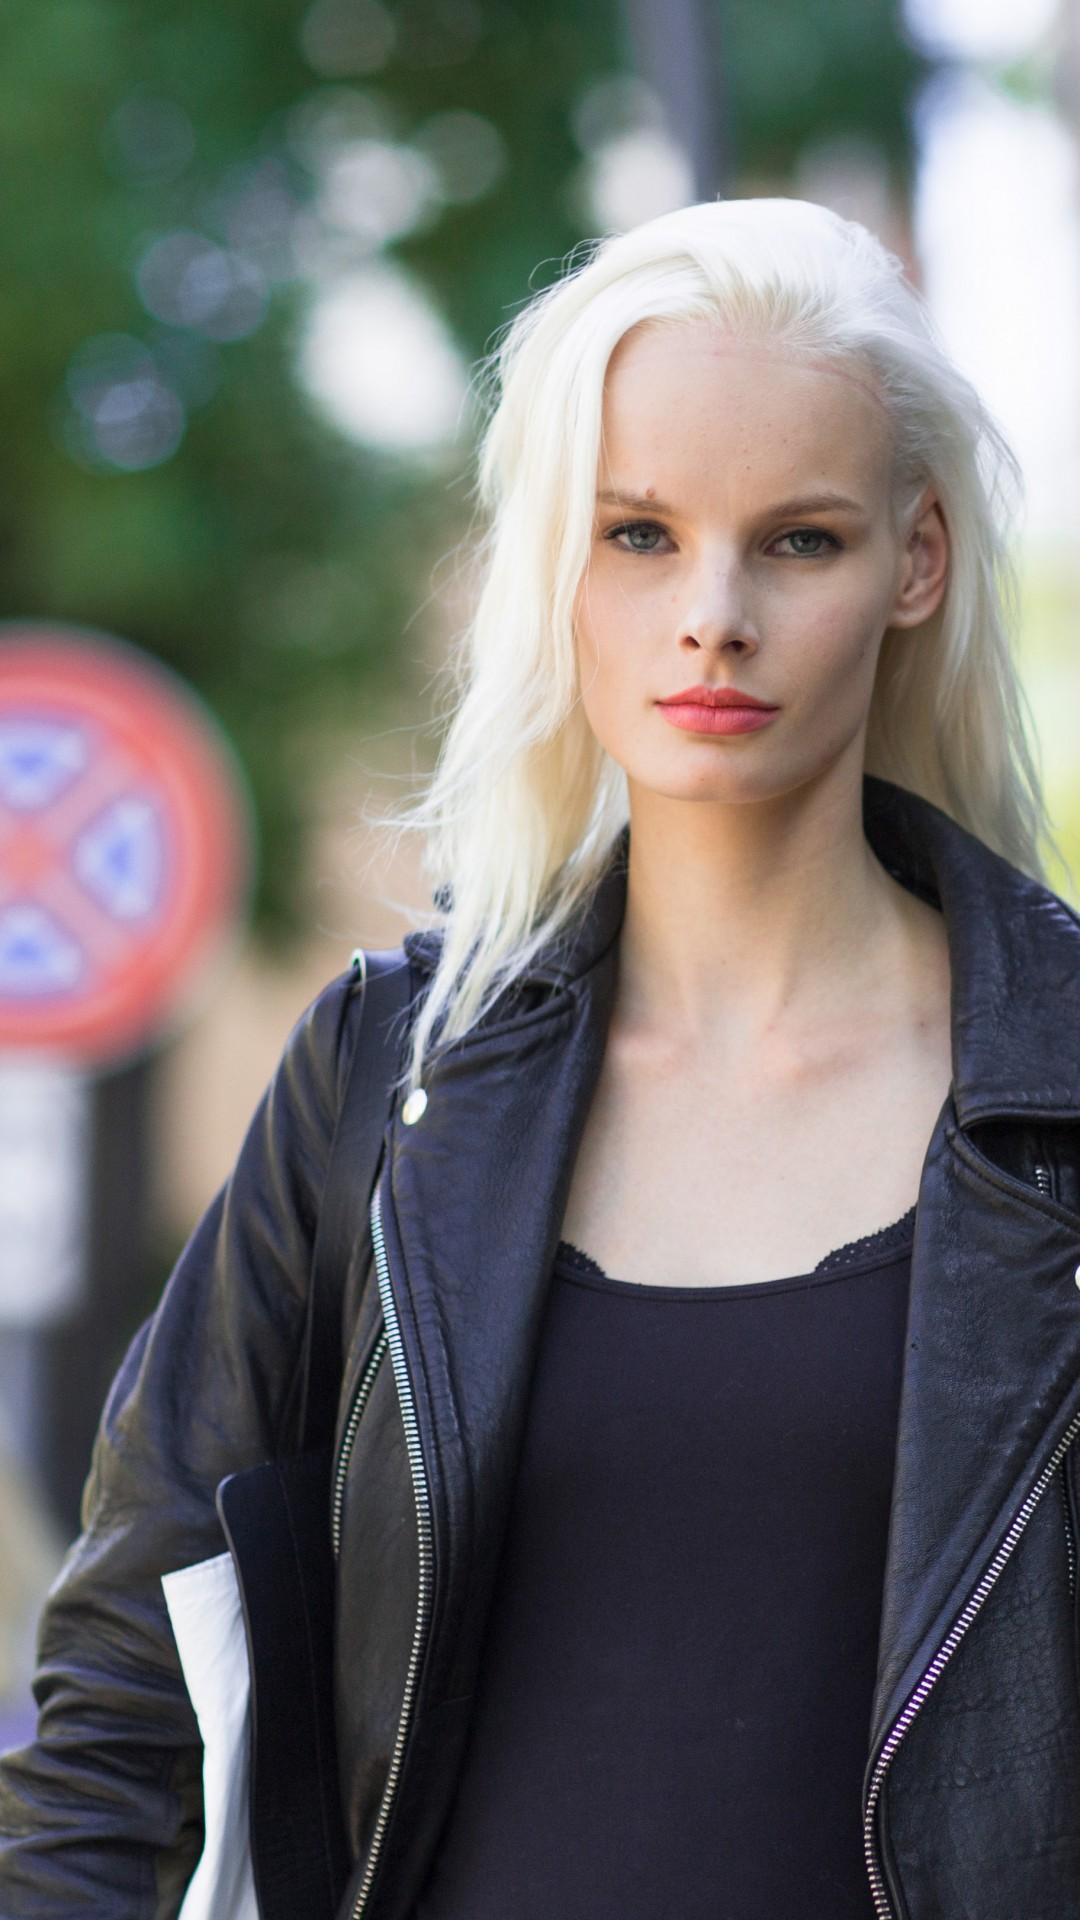 Wallpaper Irene Hiemstra Top Fashion Models 2015 Model